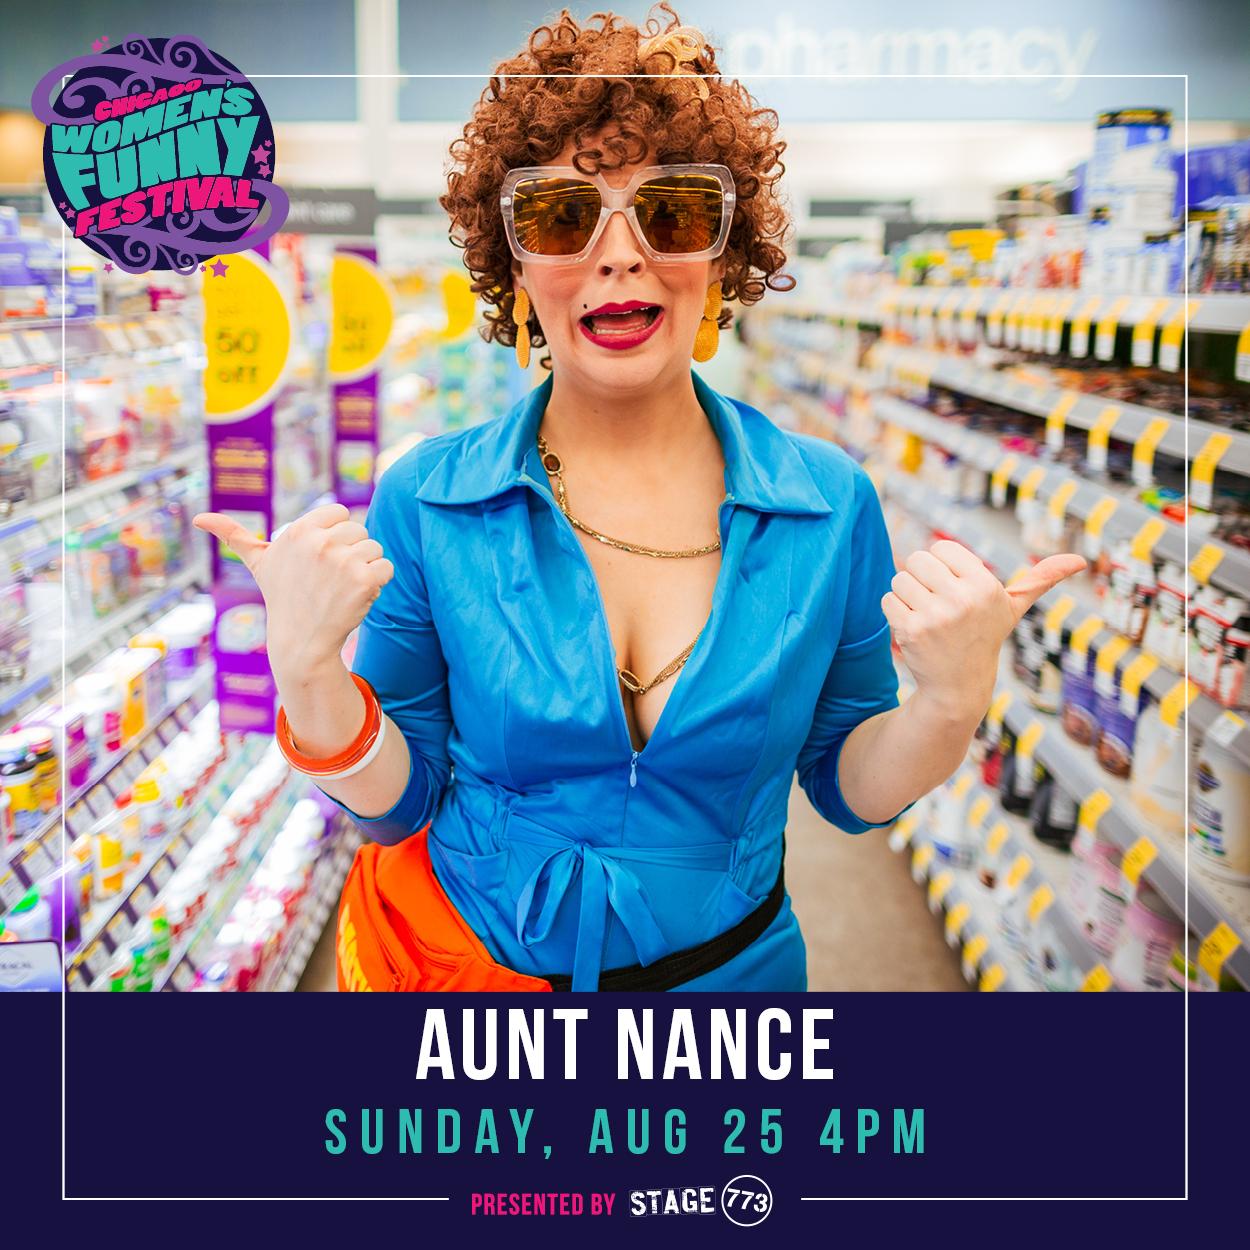 AuntNance_Sunday_4PM_CWFF20192.jpg